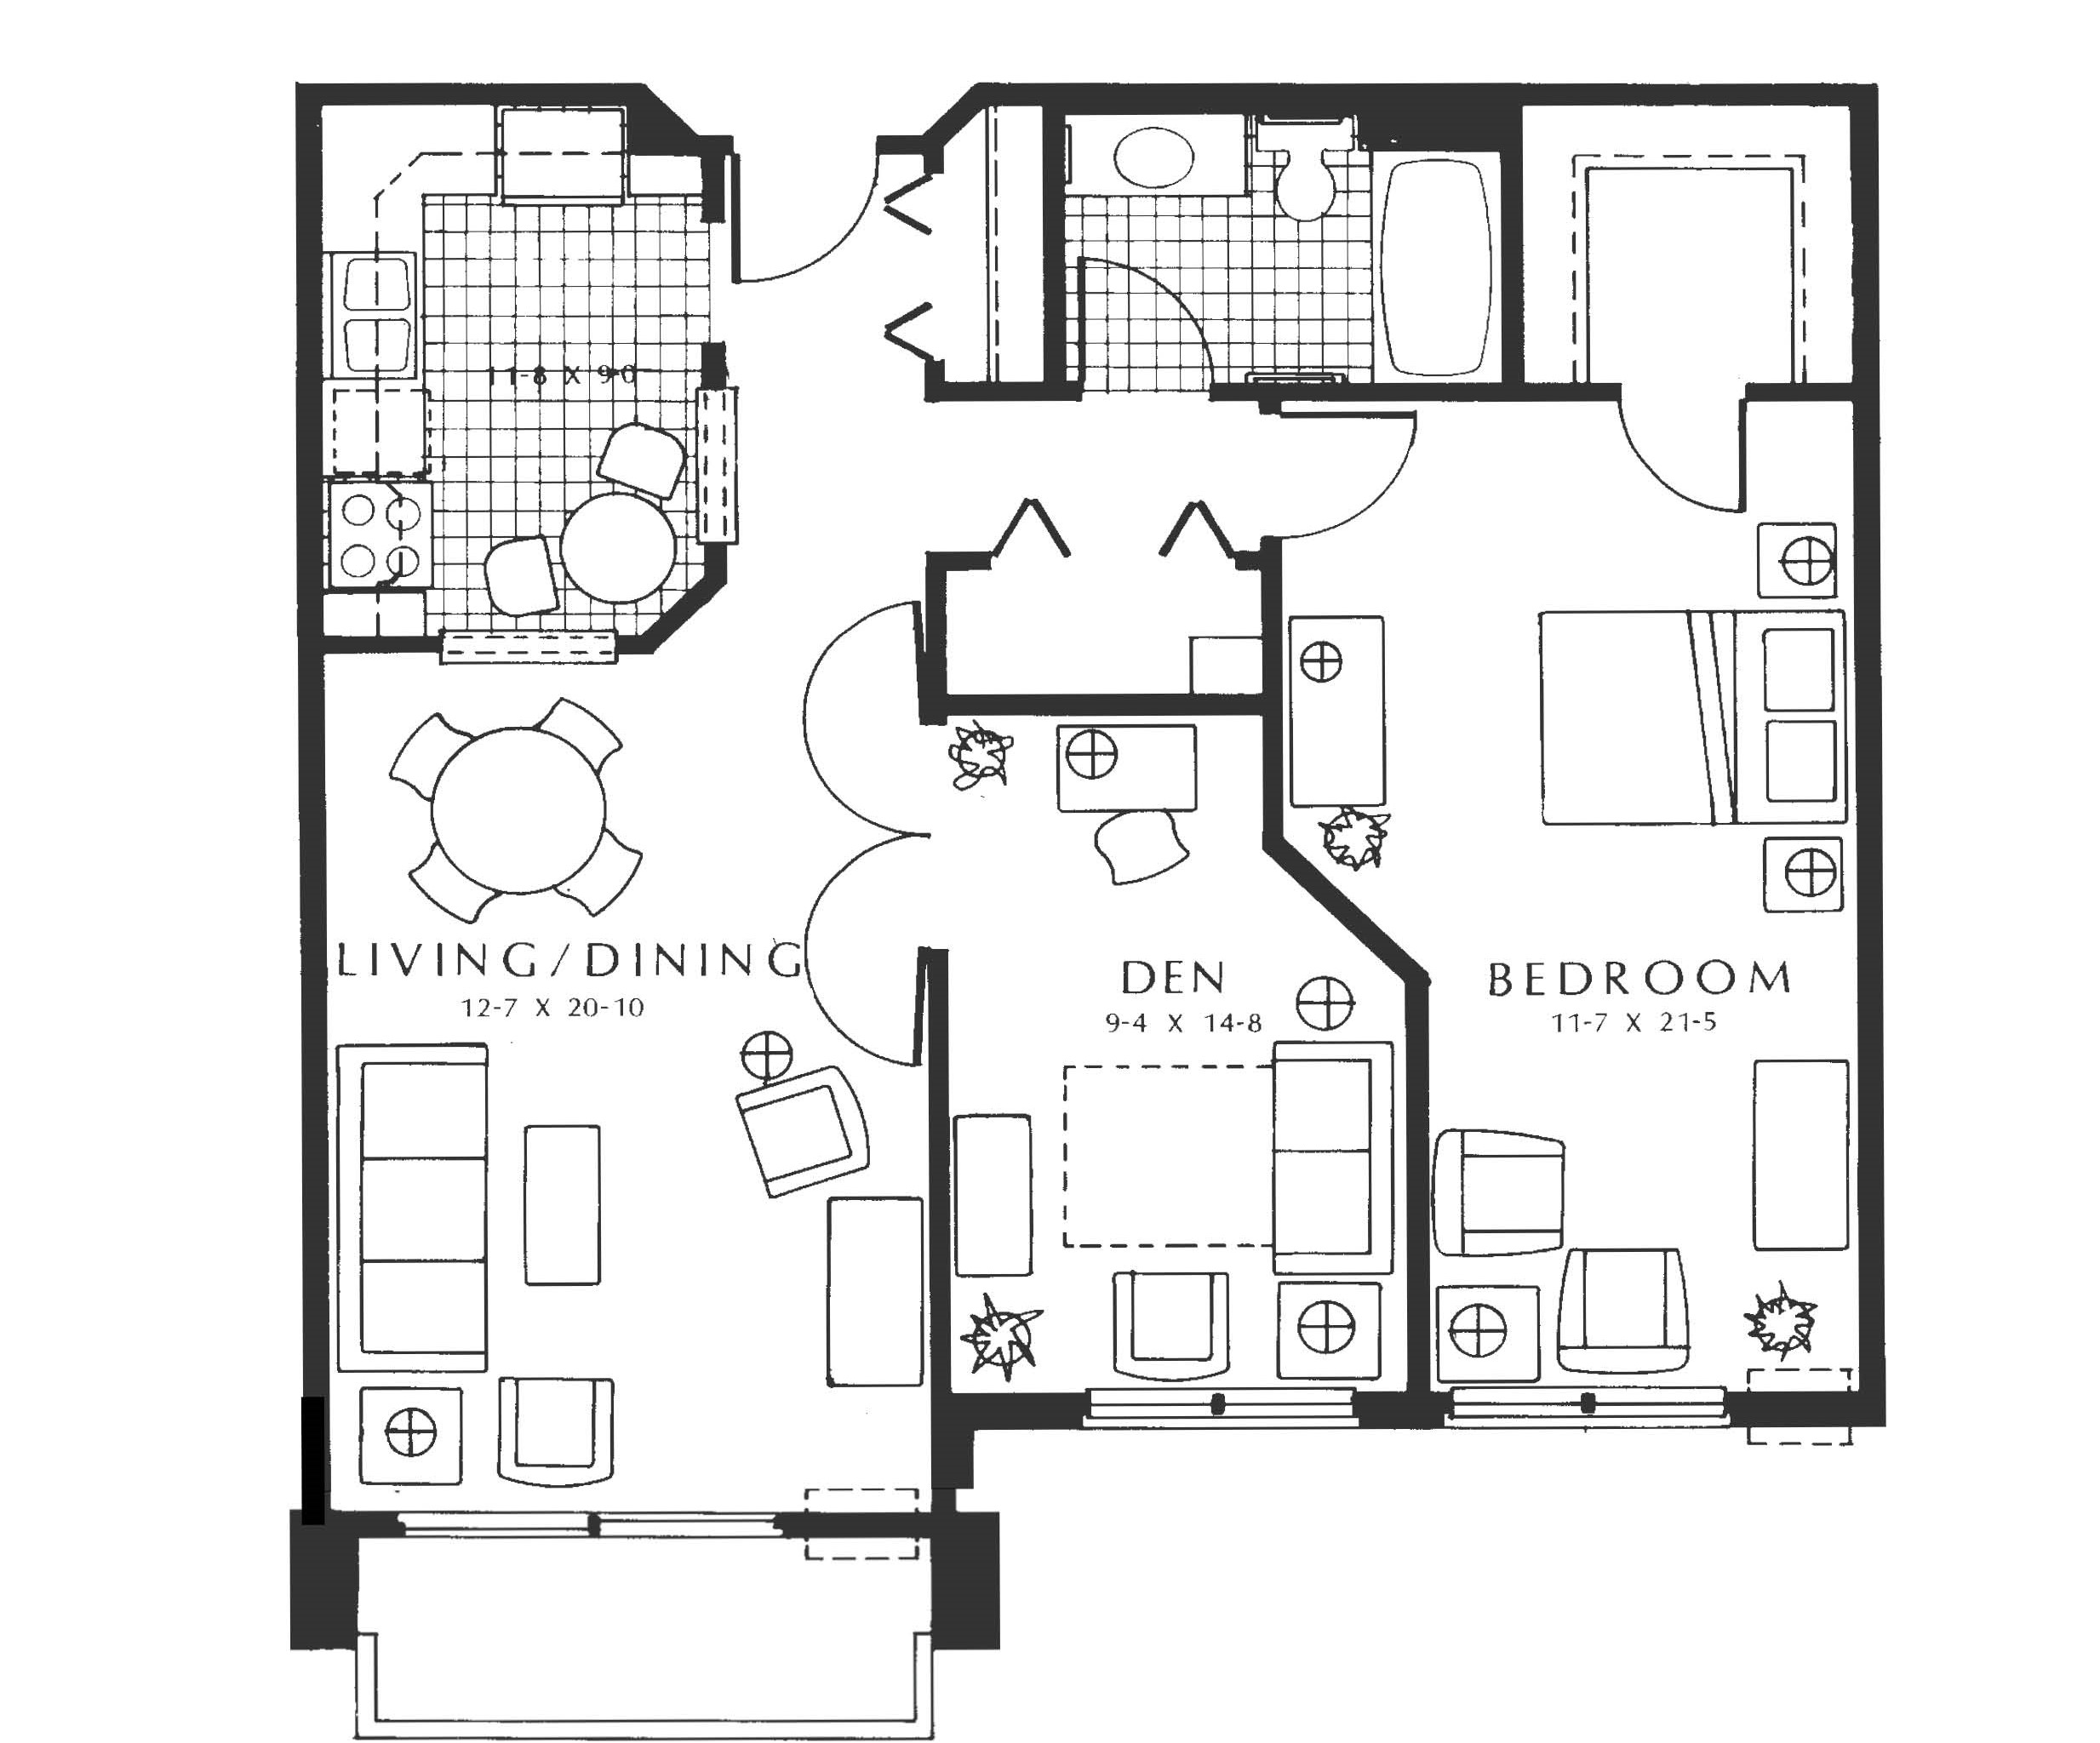 Unit B1 - Summit - 1 BR + den, 949 sq ft